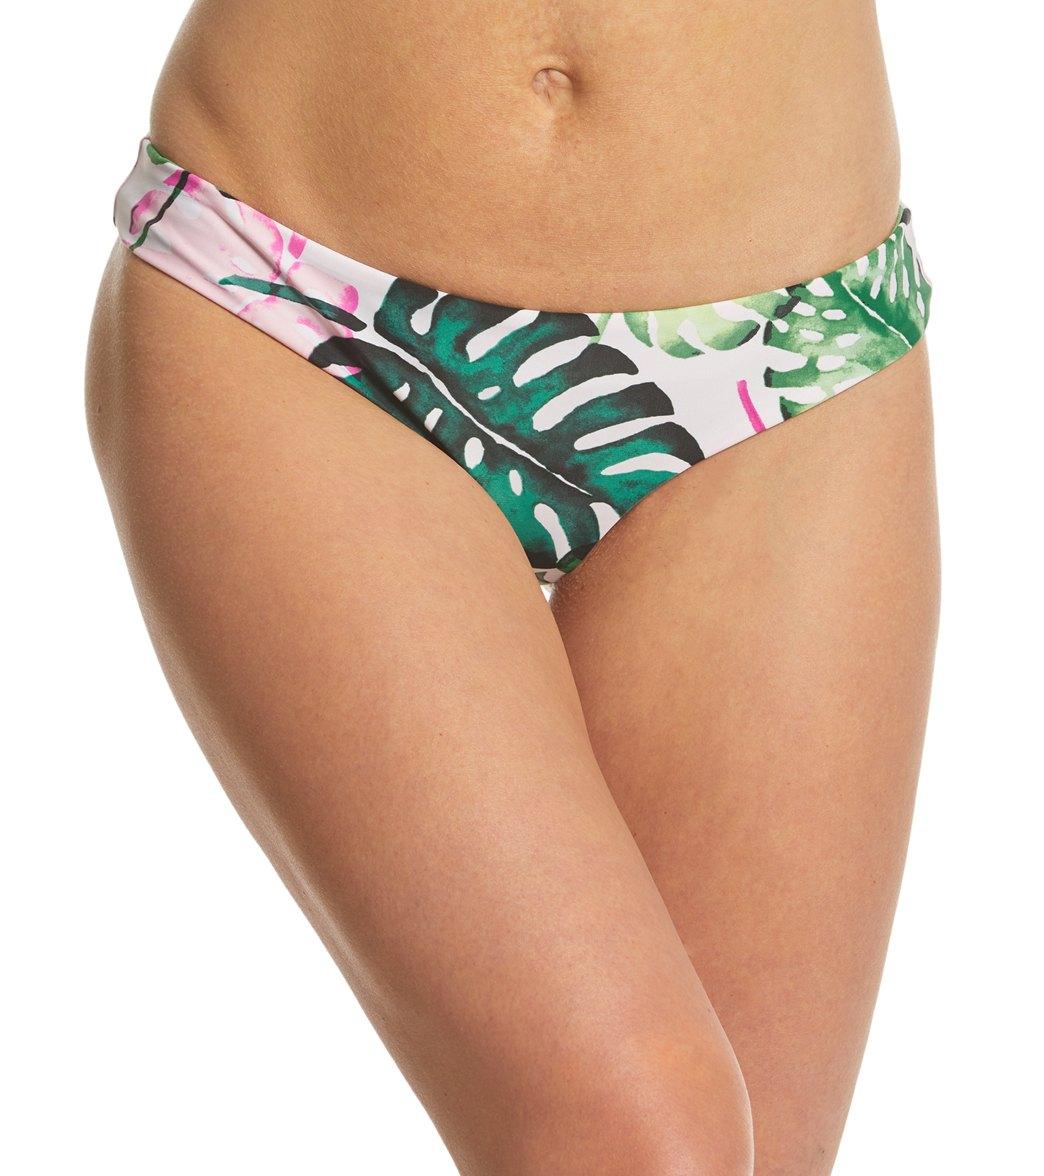 f137b178e89 Speedo Women's Printed Emily Hipster Bikini Bottom at SwimOutlet.com - Free  Shipping